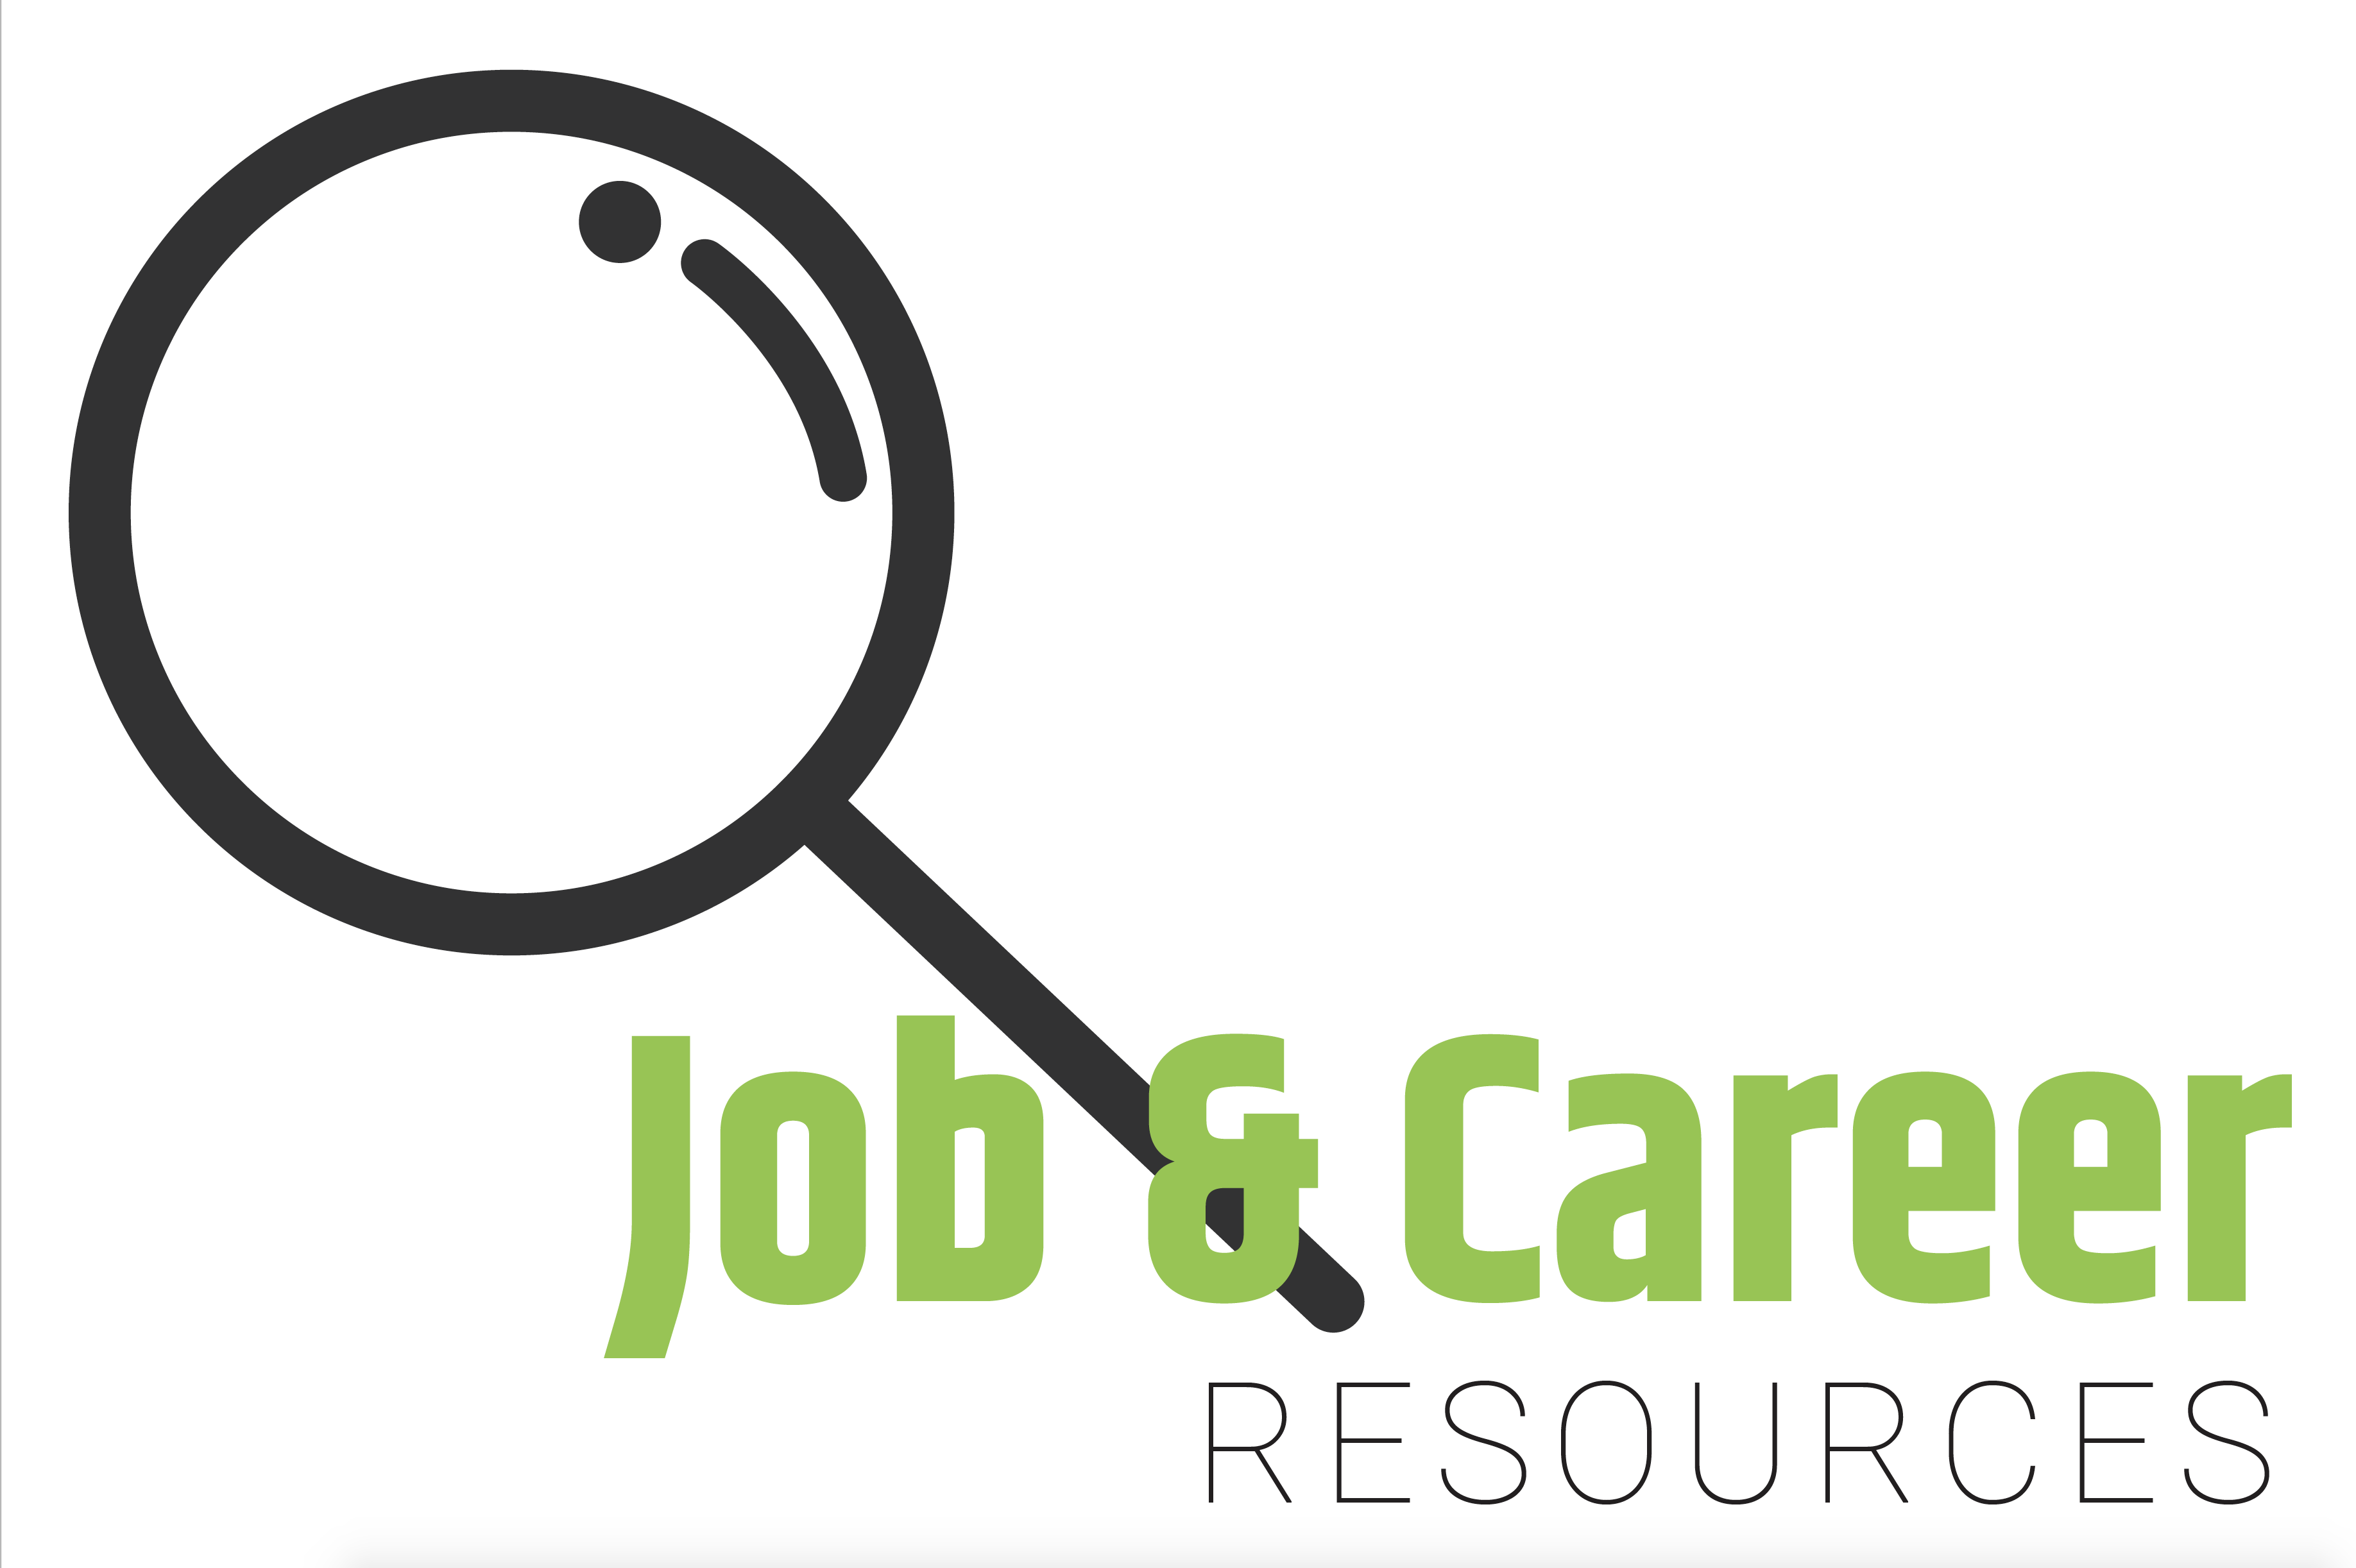 Major Night: Job & Career Resources